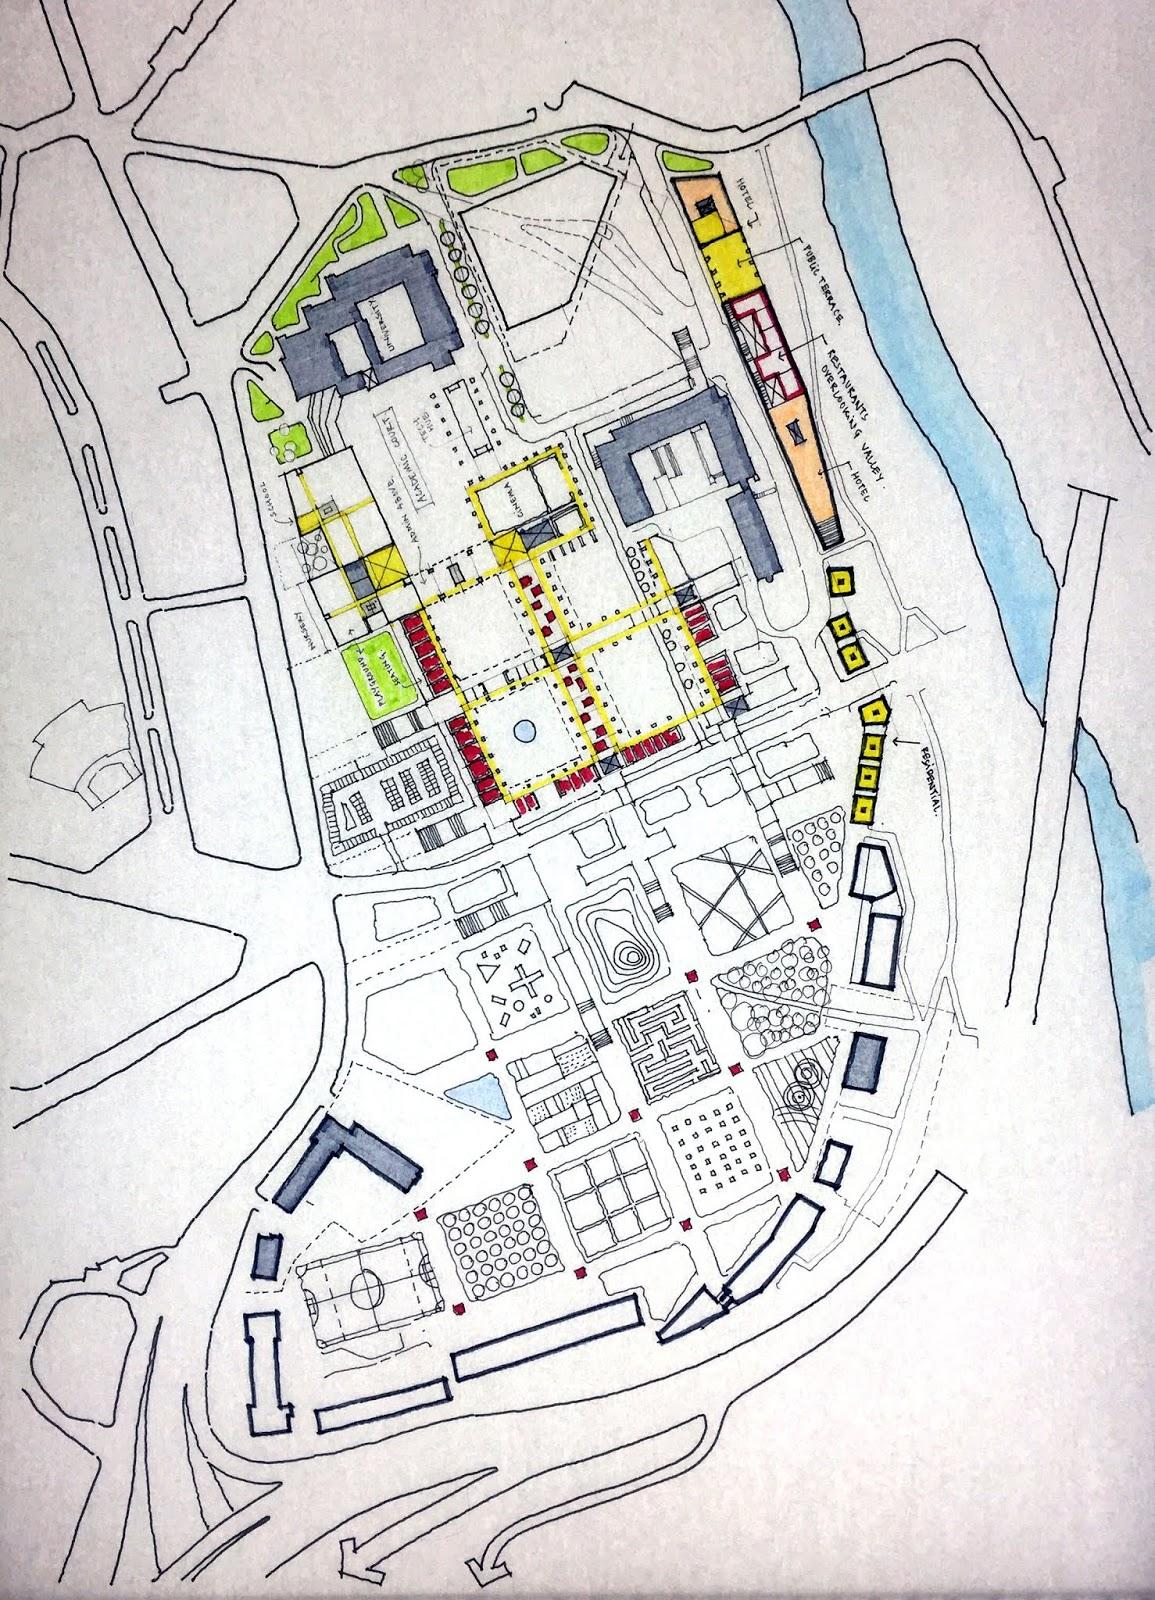 veliko tarnovo masterplan competition plan sketch